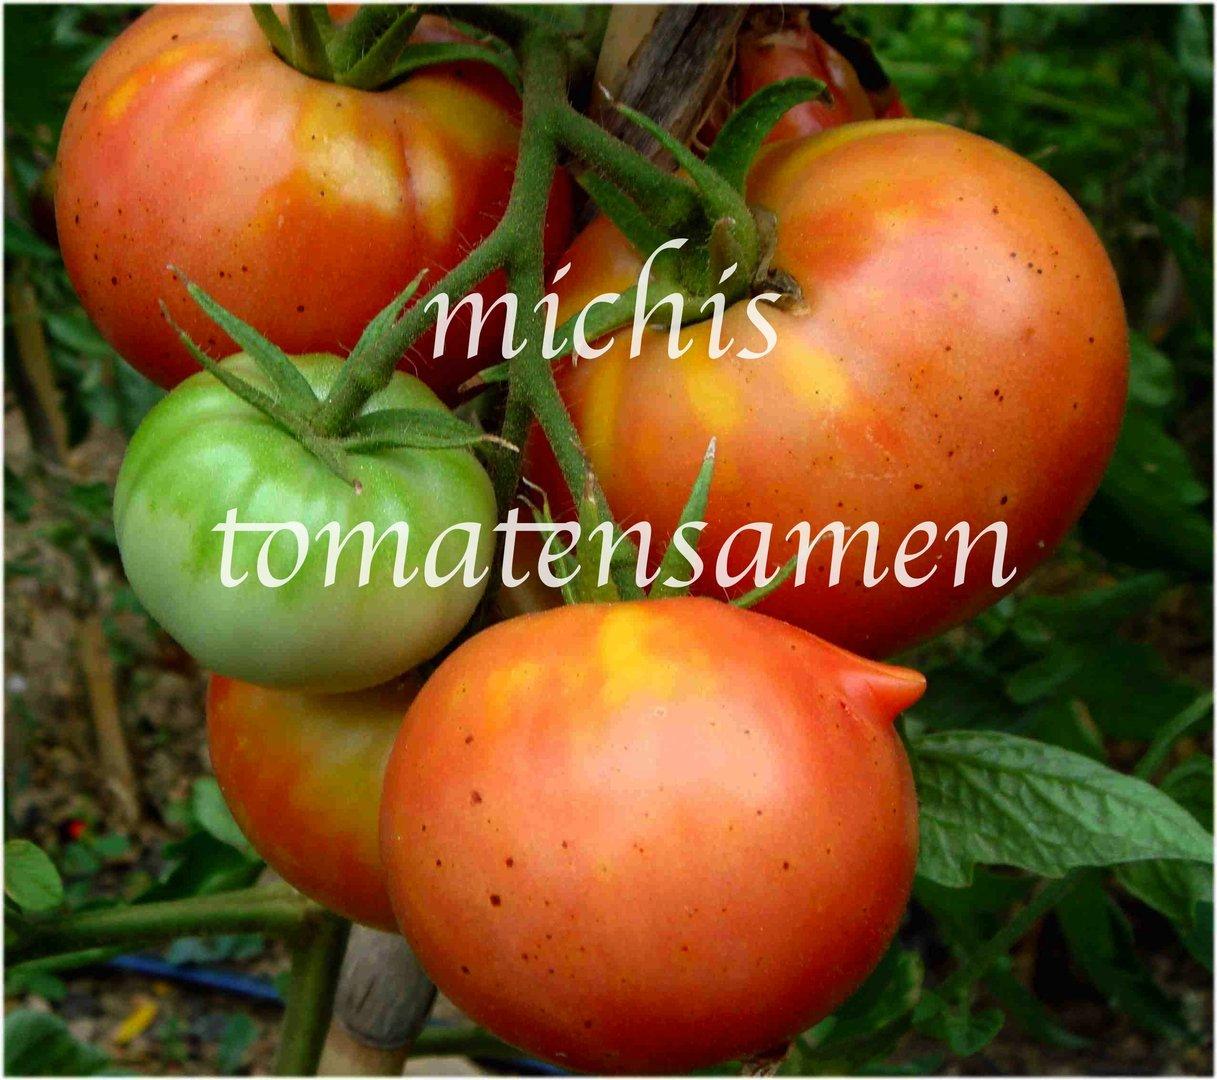 tomate bonny s best eine der besten tomaten der welt. Black Bedroom Furniture Sets. Home Design Ideas